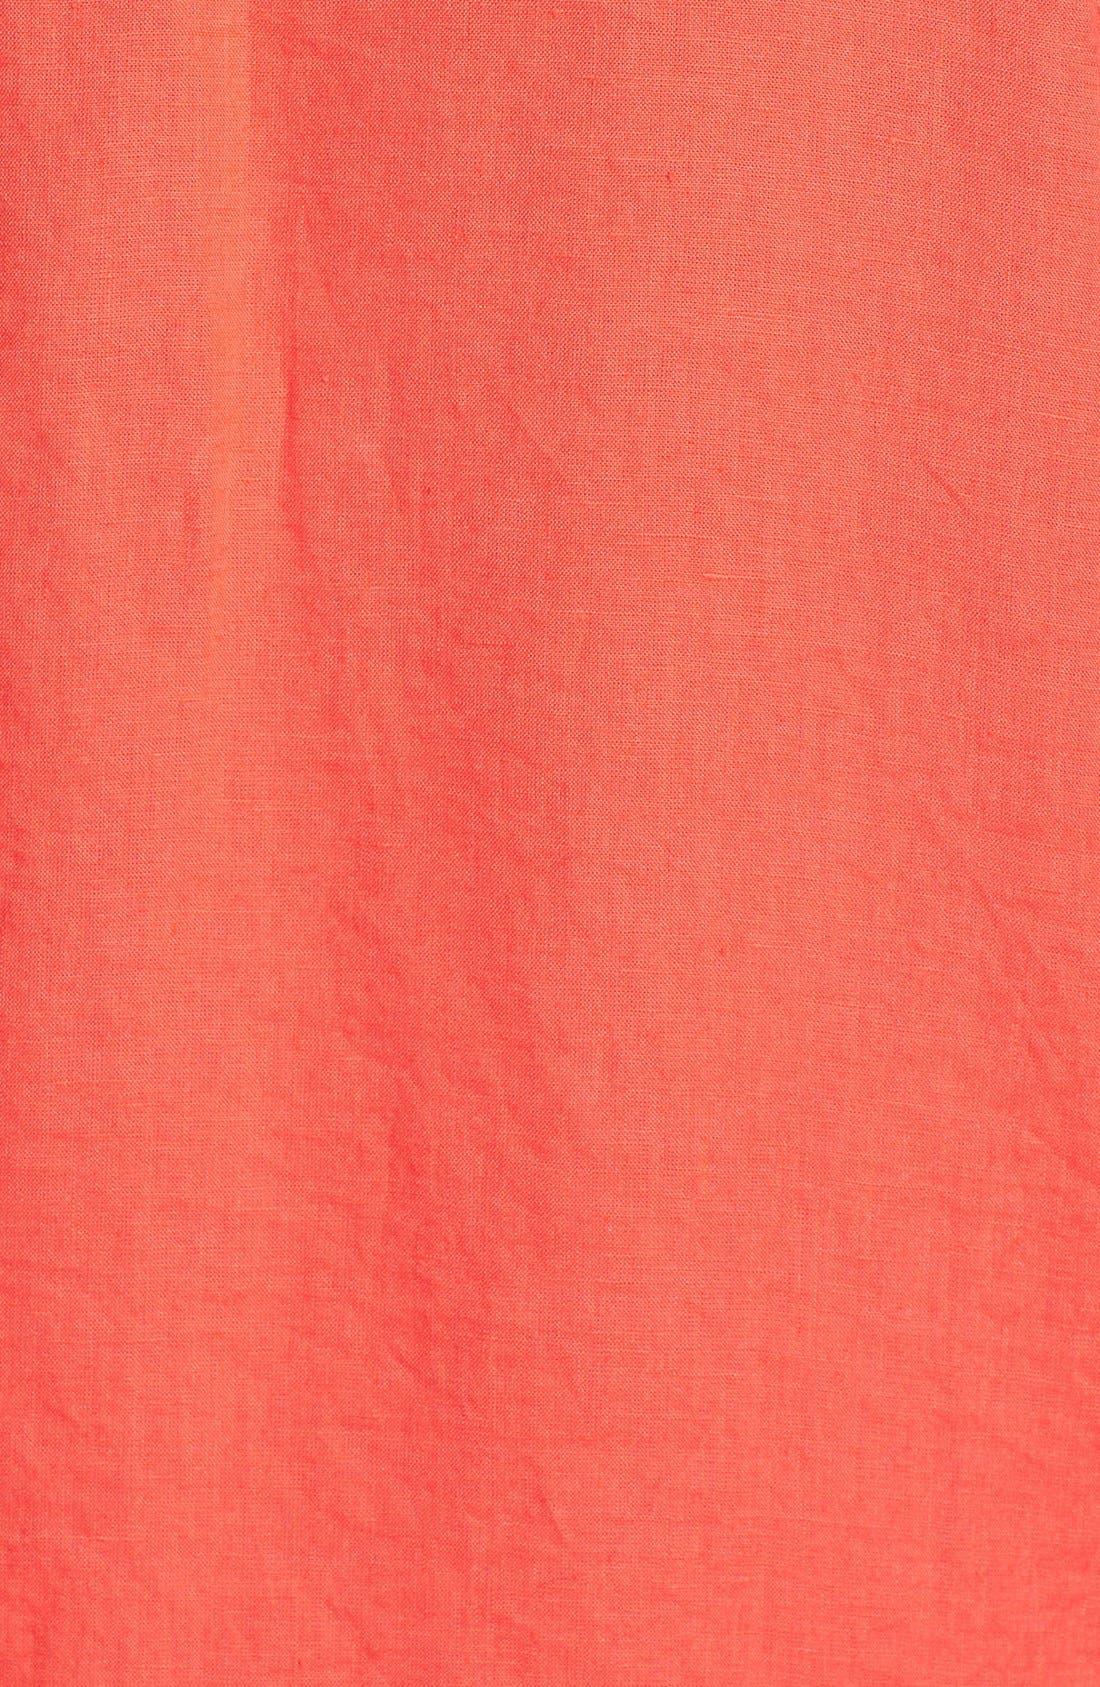 Alternate Image 3  - Eileen Fisher Mandarin Collar Linen Shirt (Plus Size)